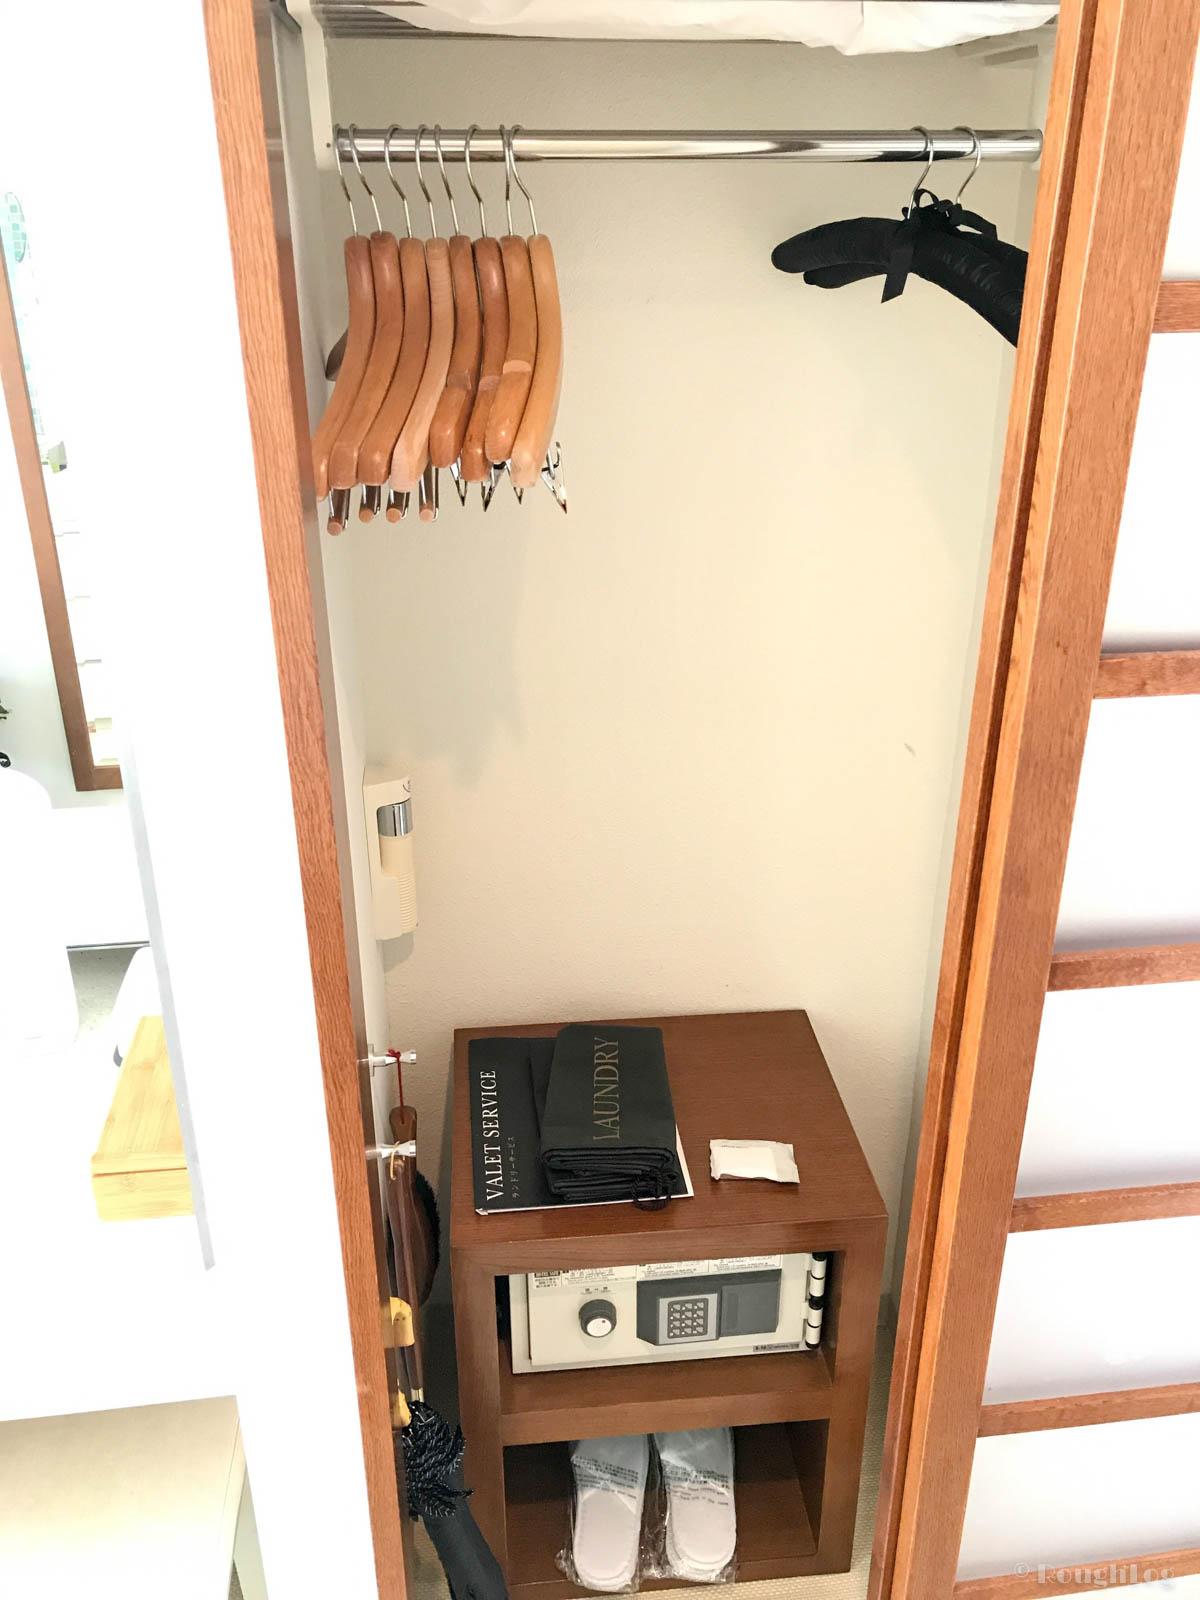 ANAインターコンチネンタル万座ビーチリゾートのホテル客室